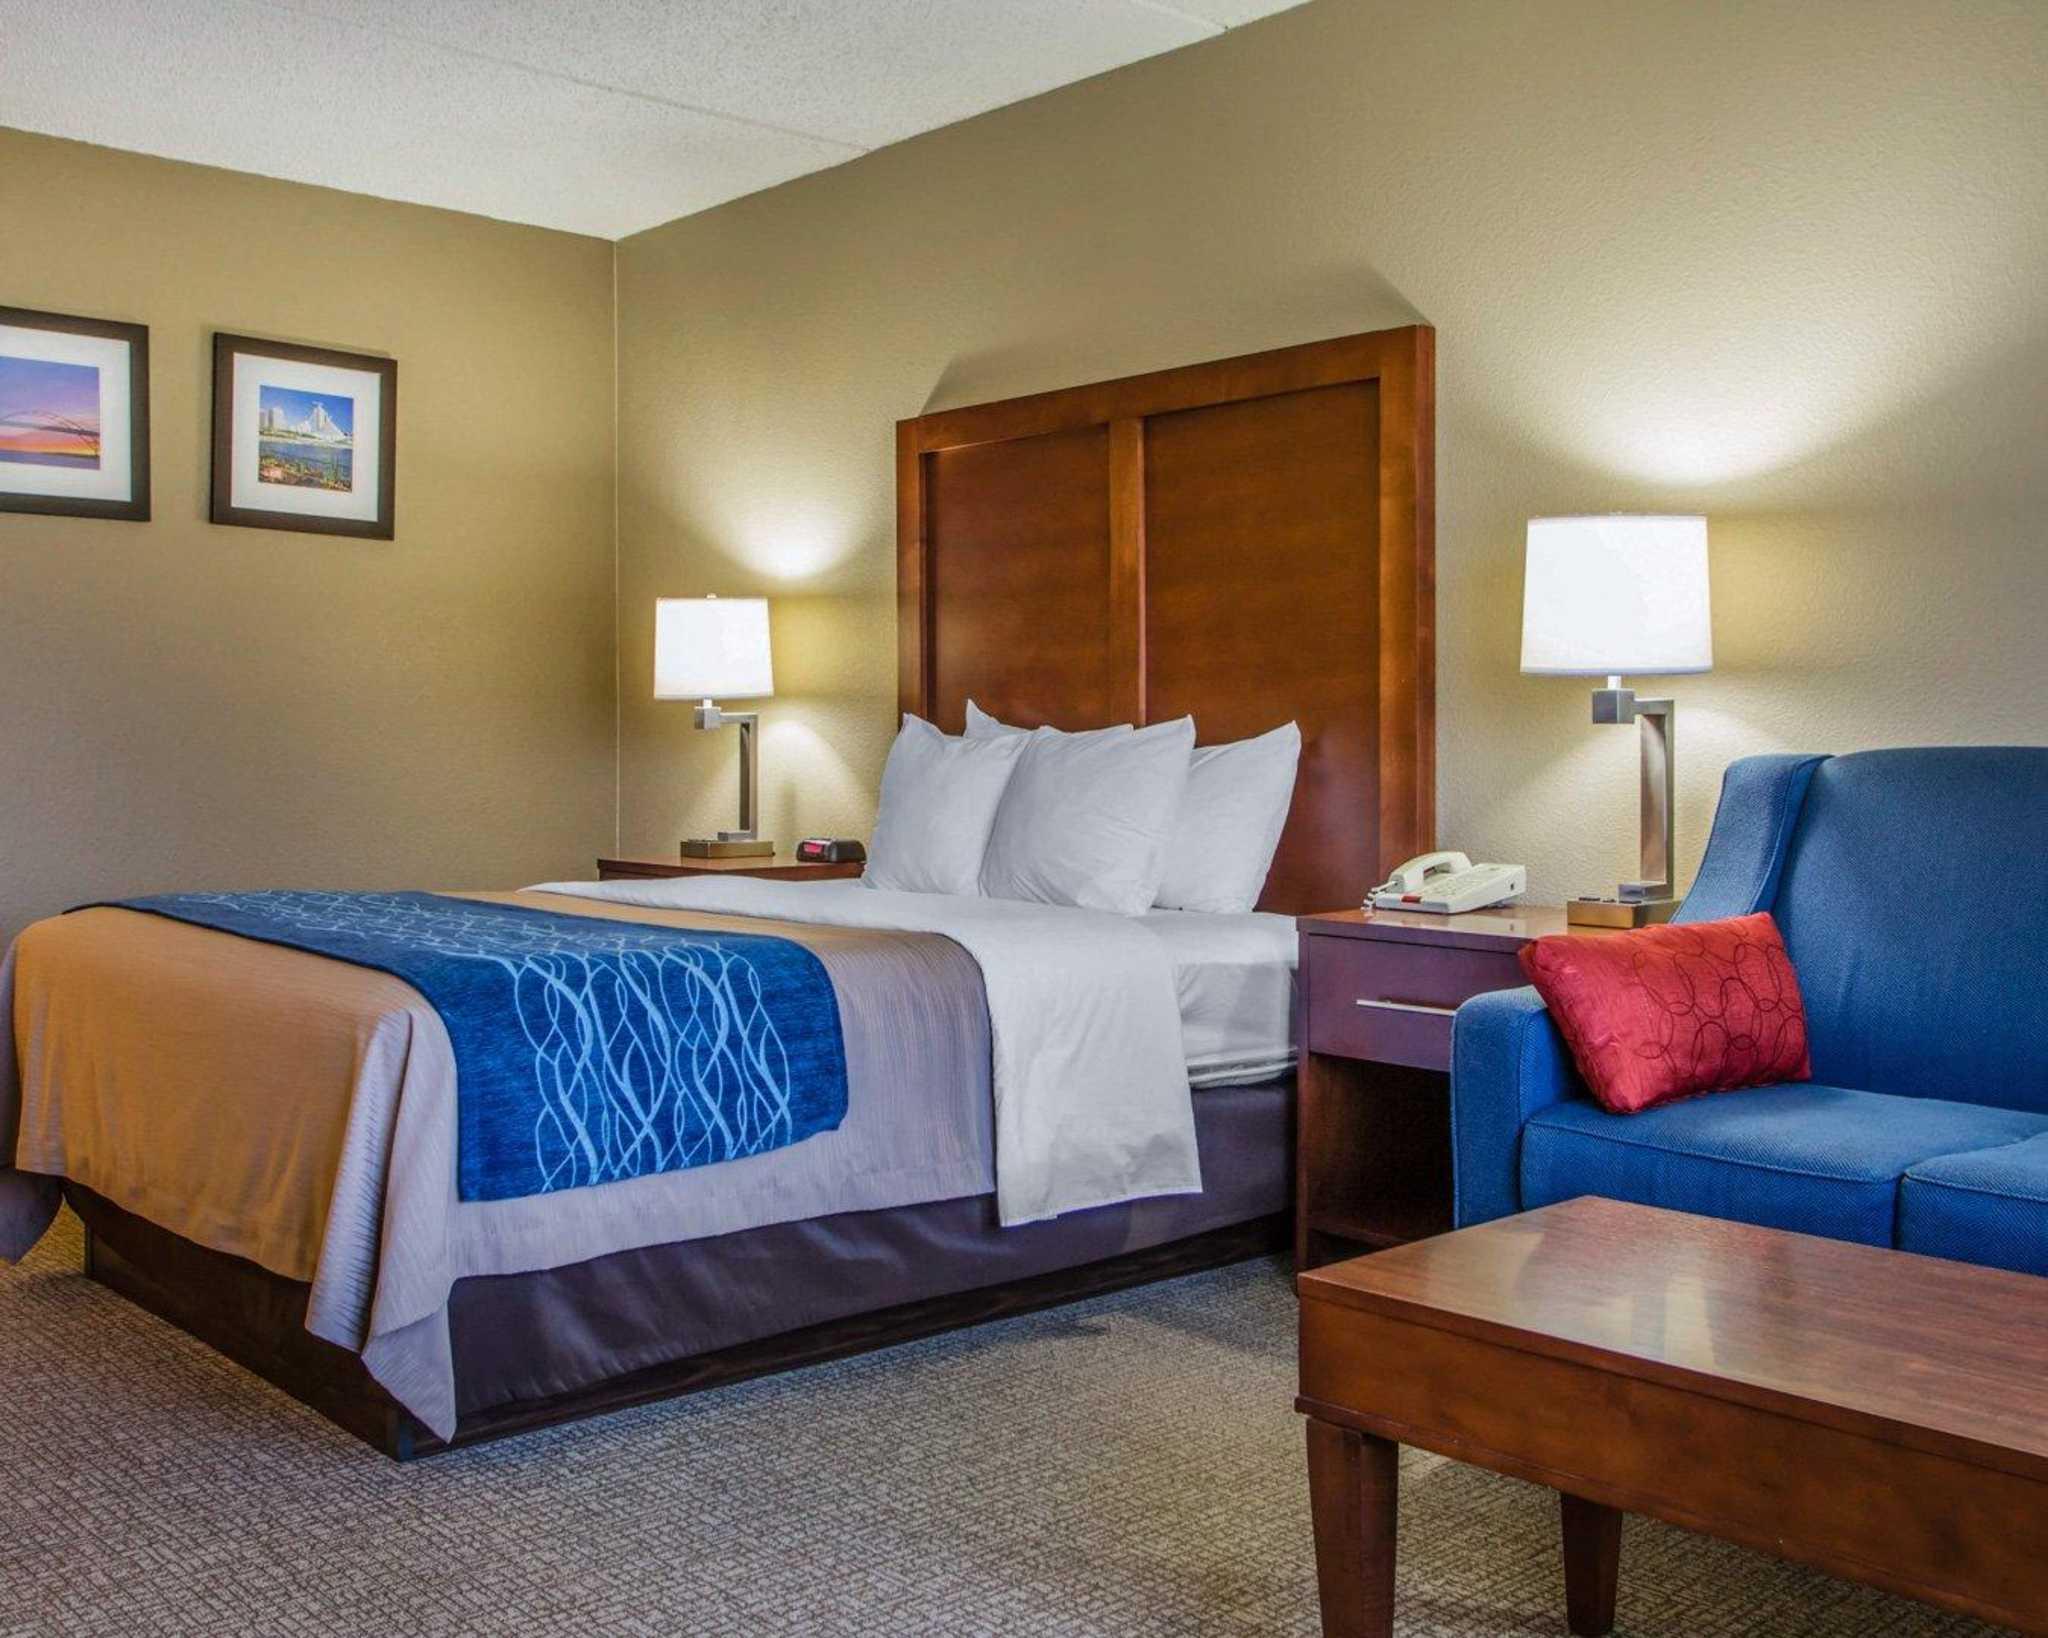 Comfort Inn & Suites Jackson - West Bend image 6